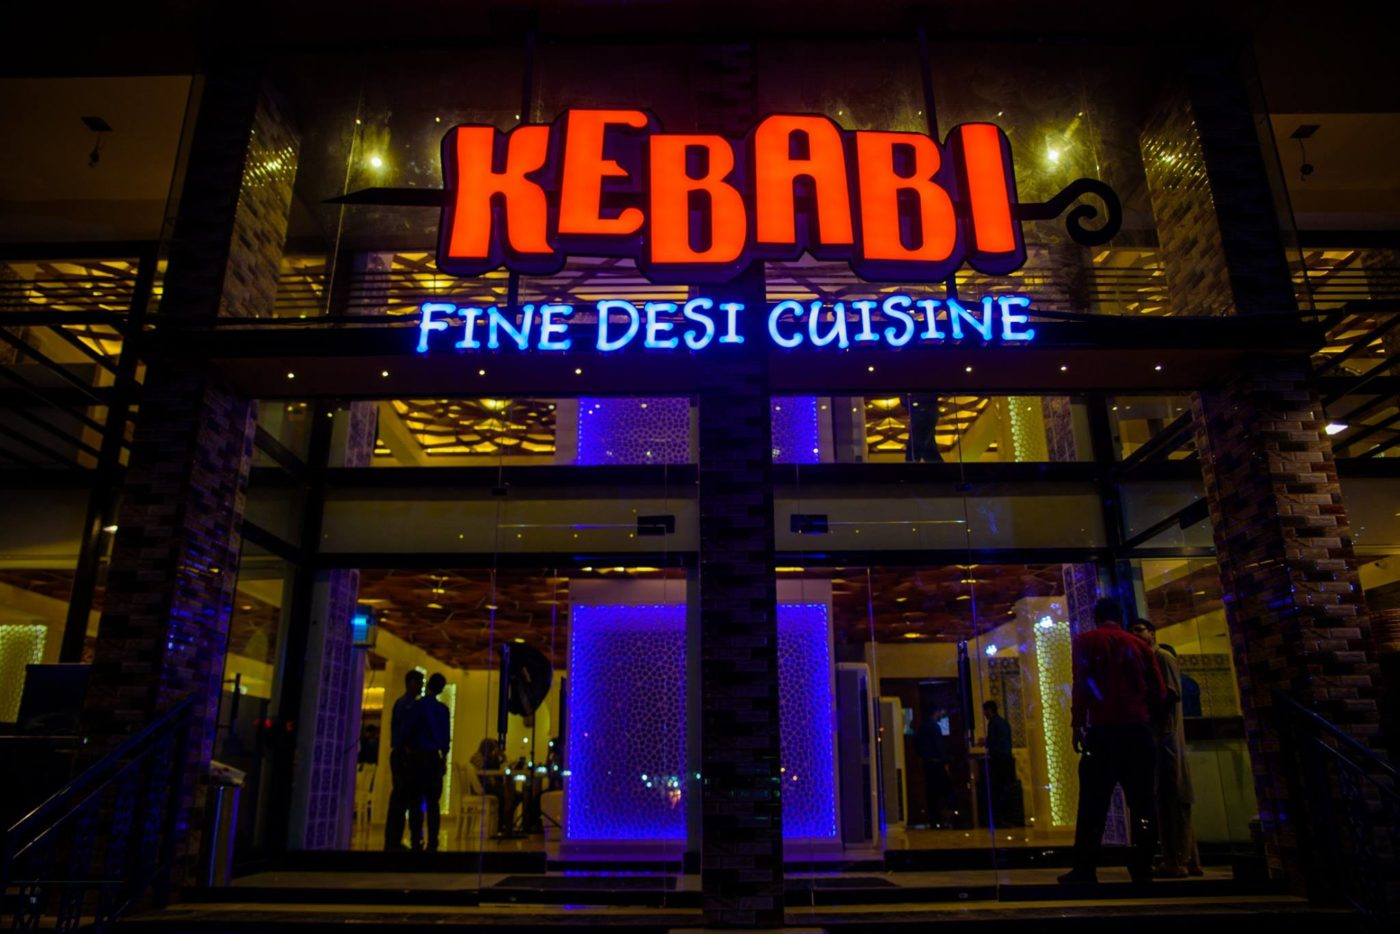 kebabi feature image - Kebabi: Fried Batair and a Love so Rare